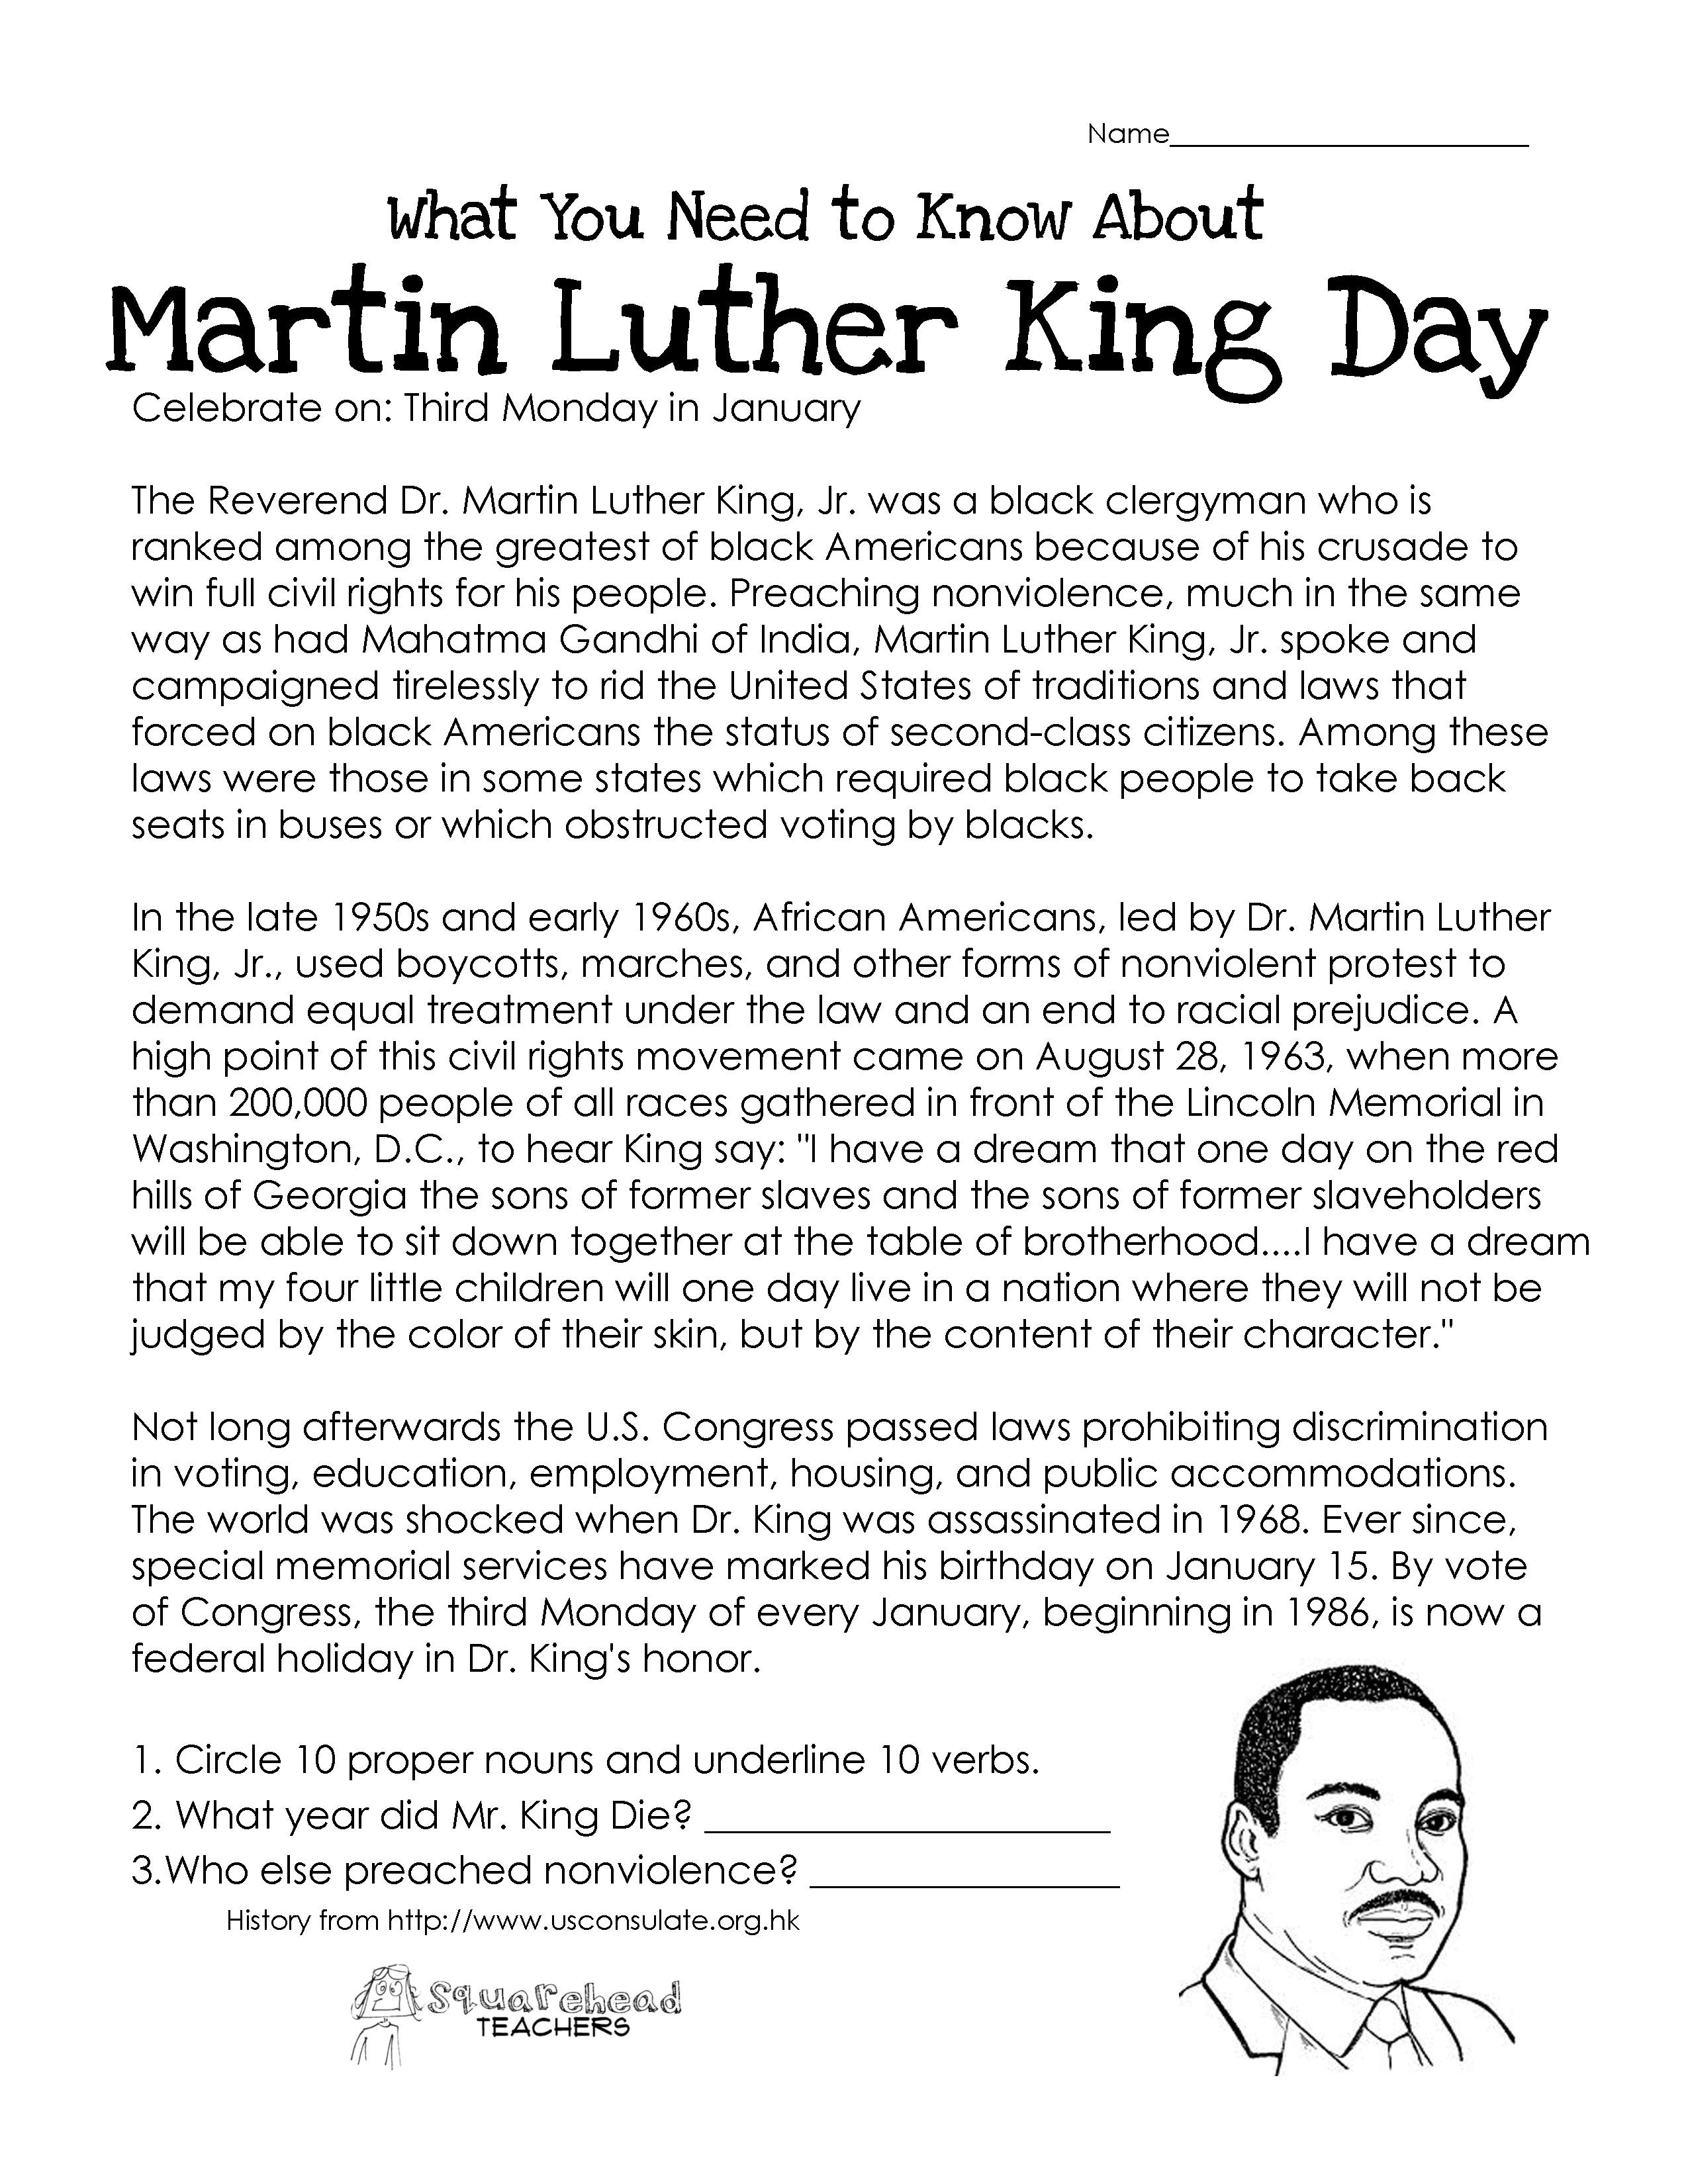 Martin Luther King Day (Free Worksheet) | Squarehead Teachers - Free Printable Martin Luther King Jr Worksheets For Kindergarten